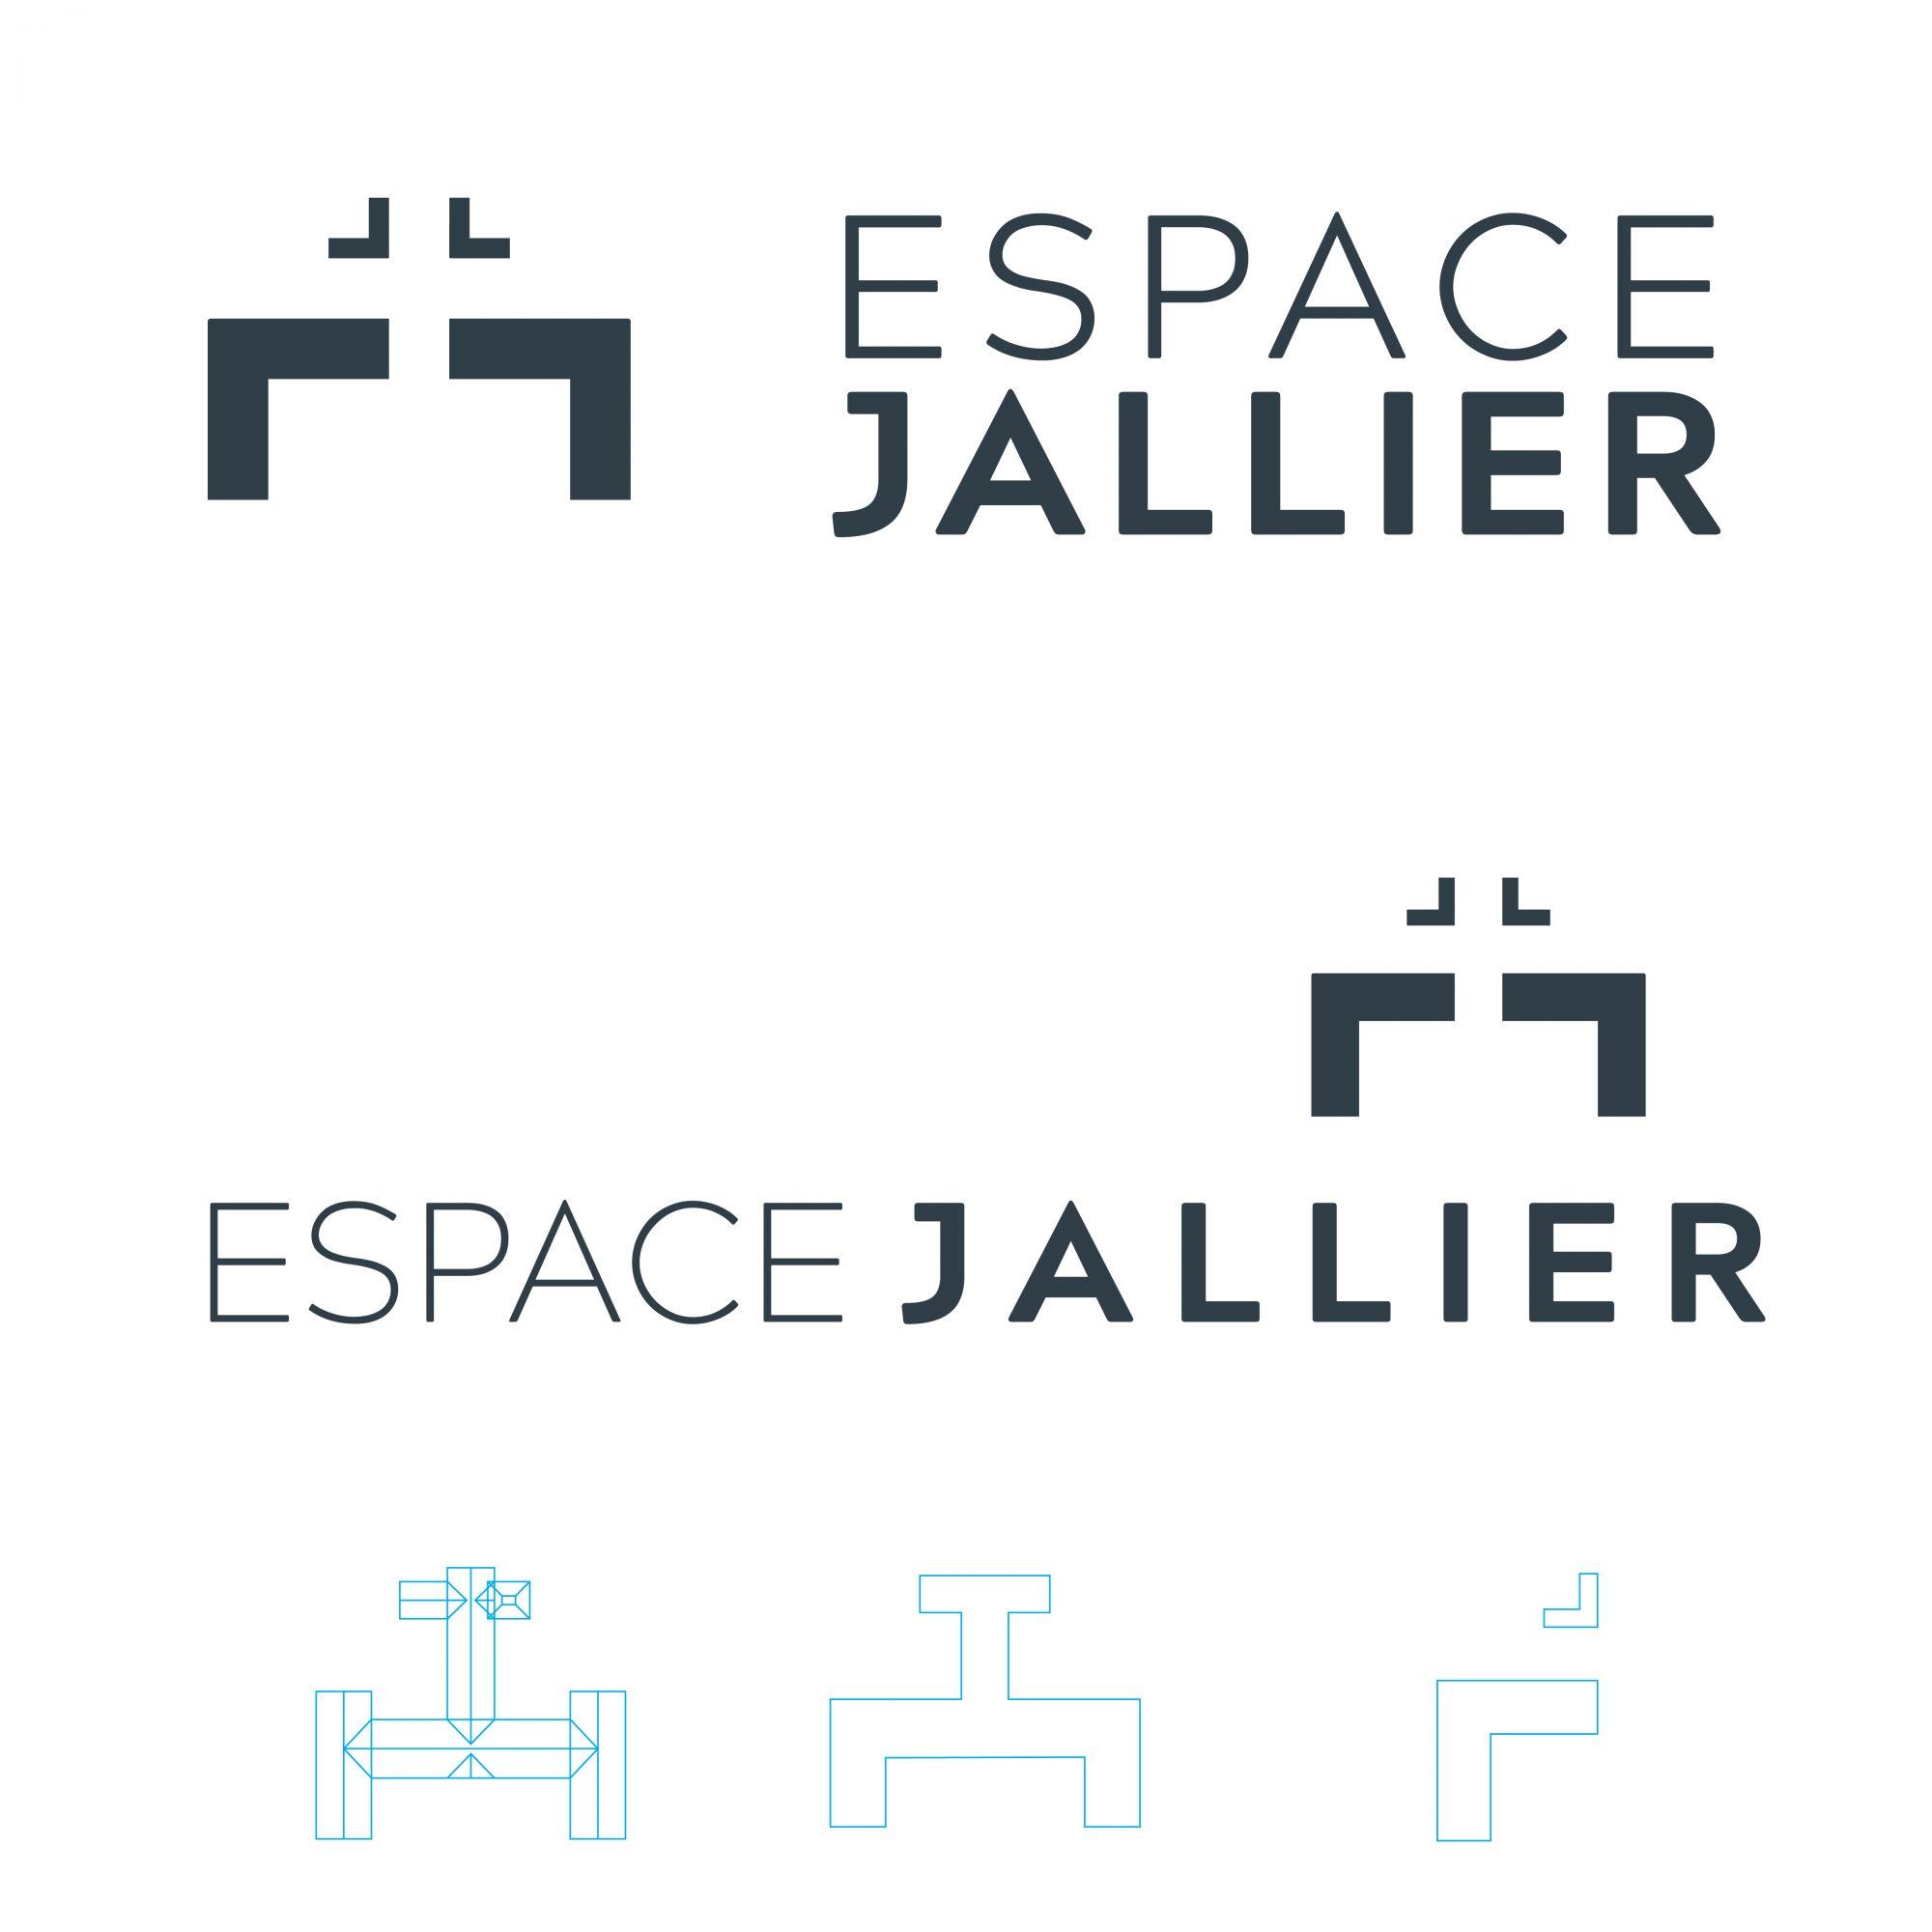 espace jallier7